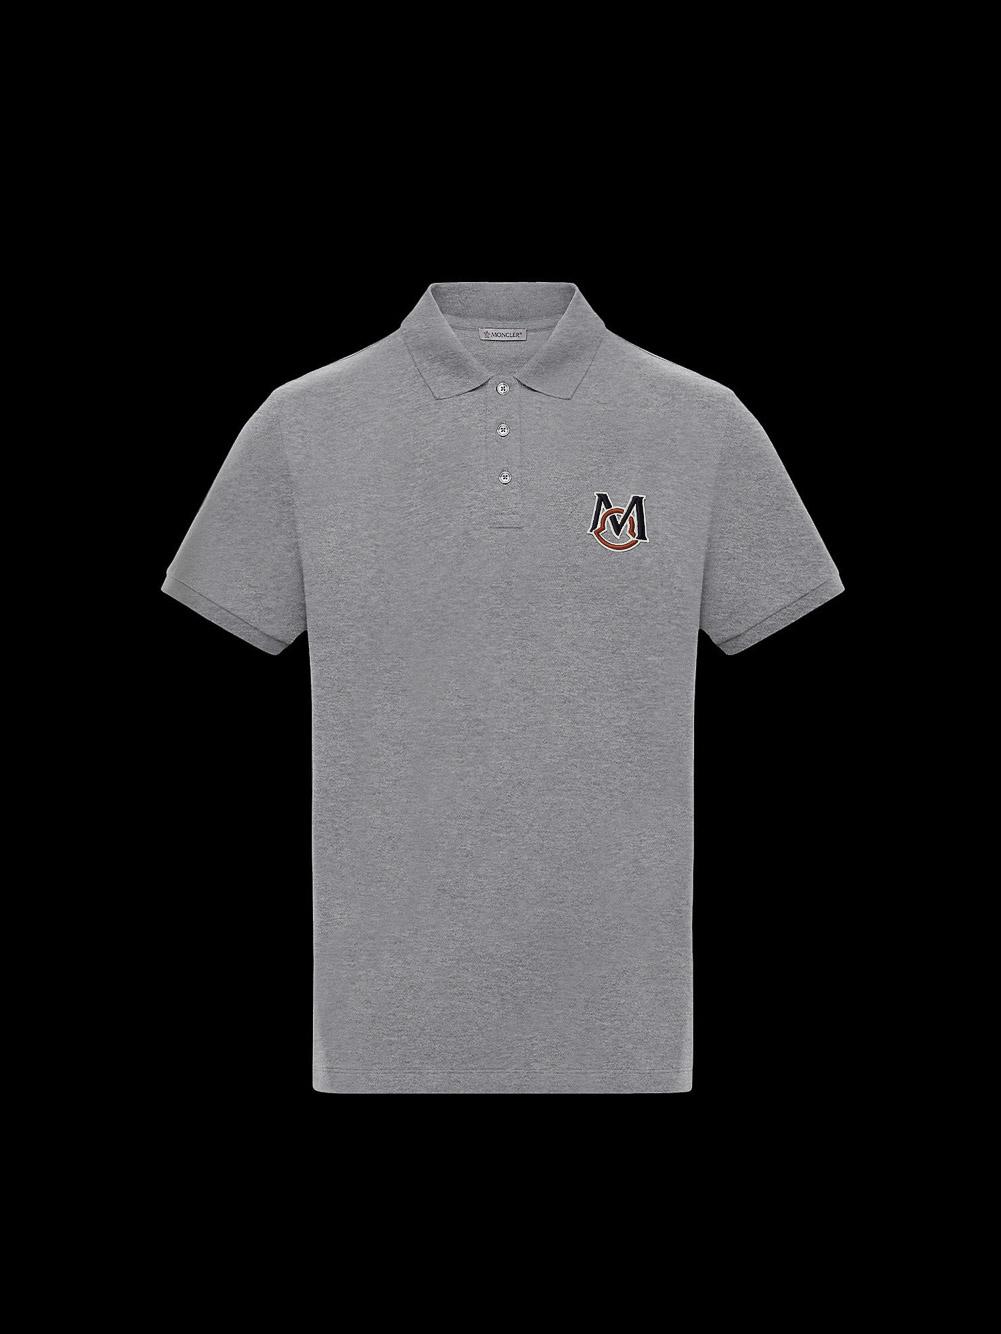 MONCLER Μπλούζα Polo 0918A7290084556-984 ΓΚΡΙ